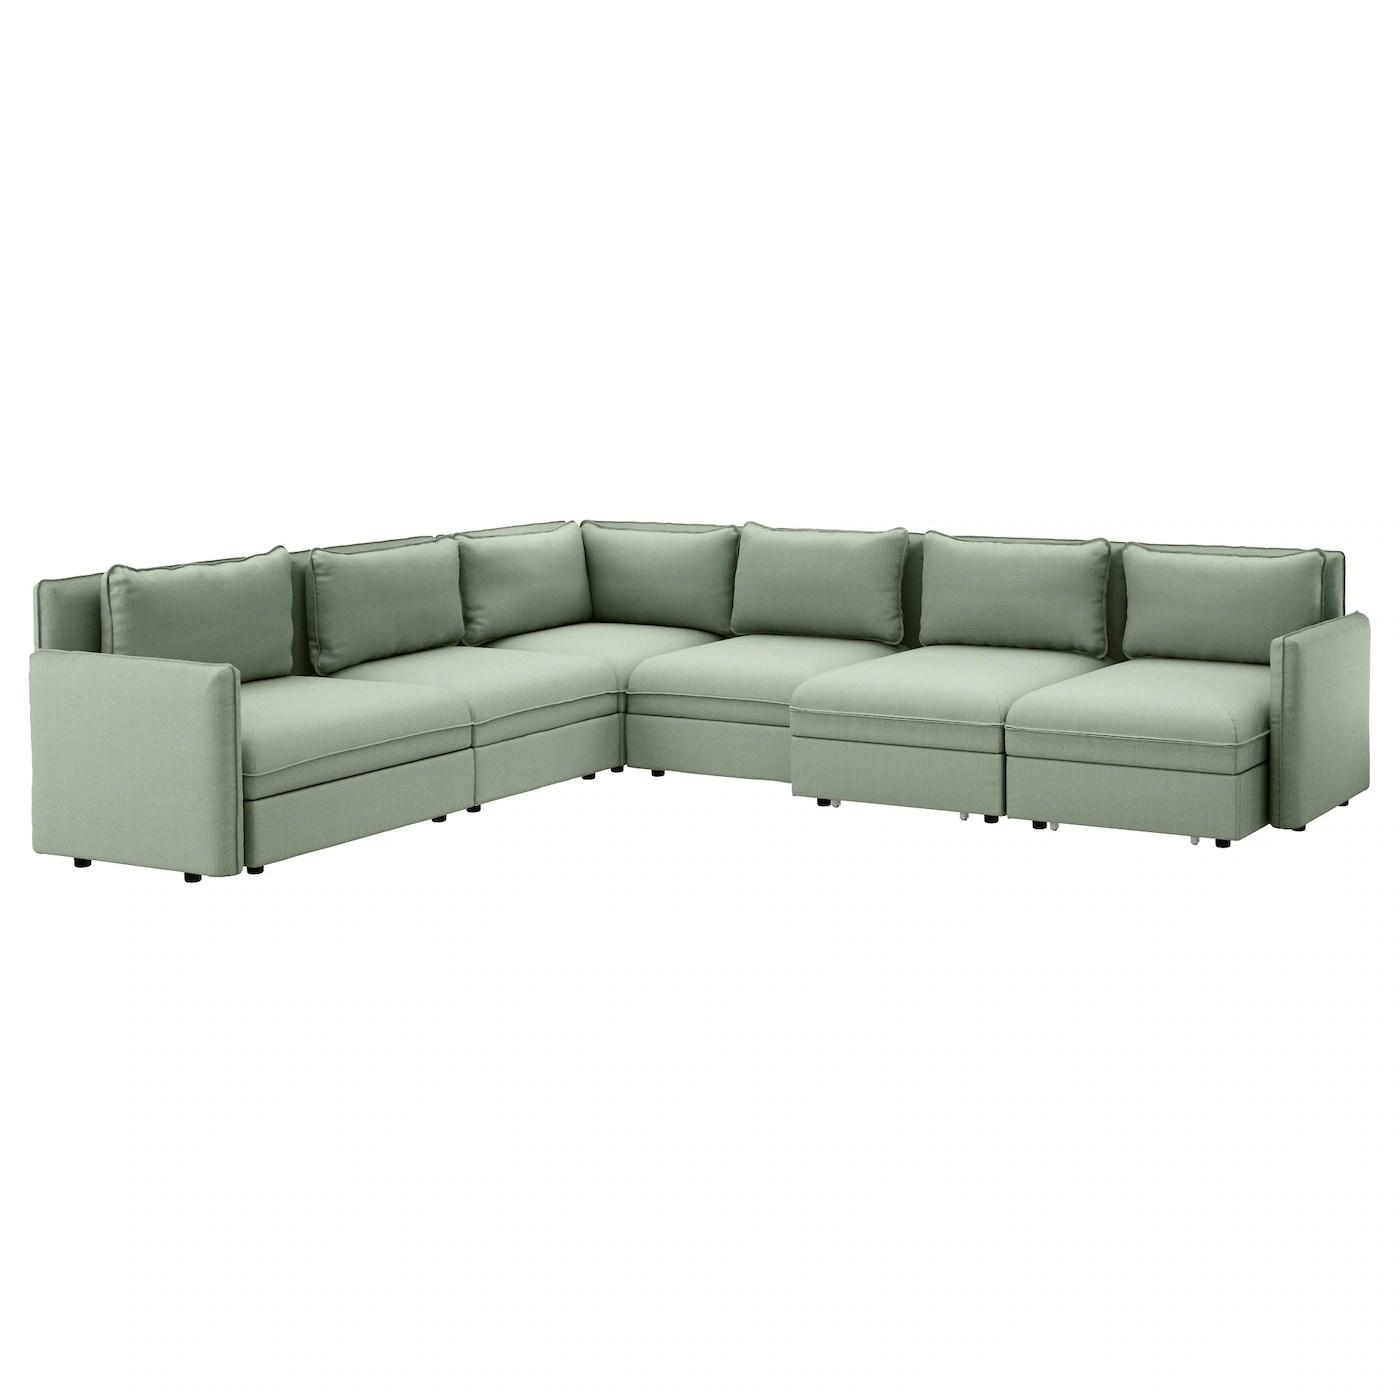 corner sofa bed dublin sofas direct armadale beds ikea ireland